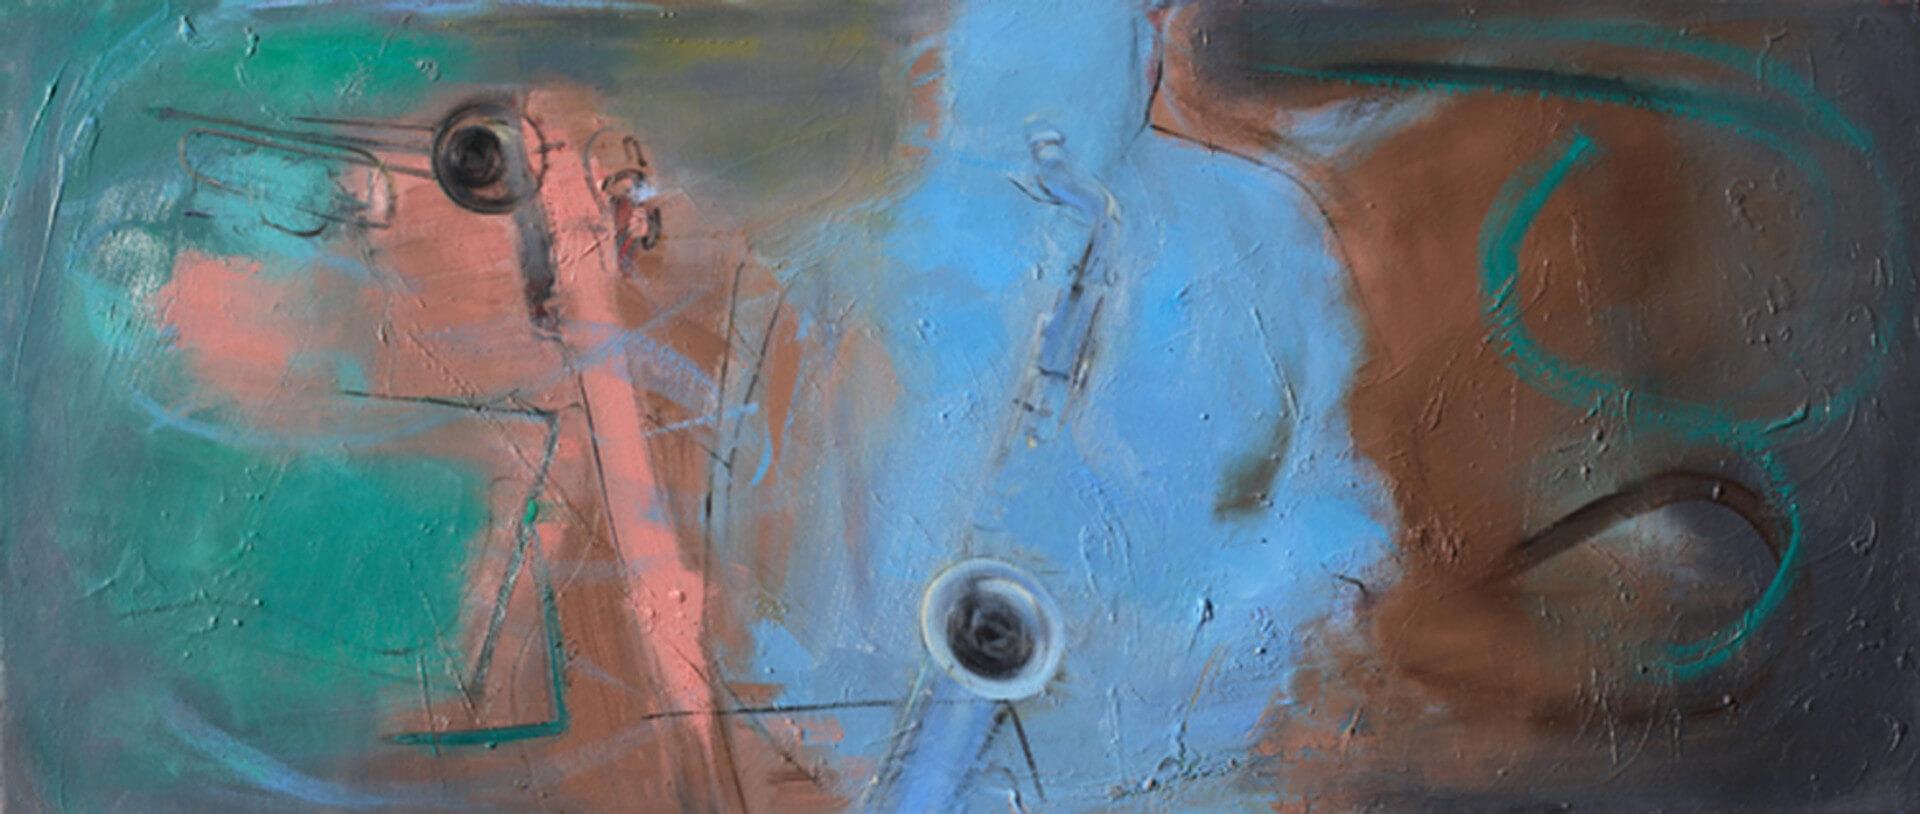 2004 - Oil on canvas. 60 cm. x 140 cm.